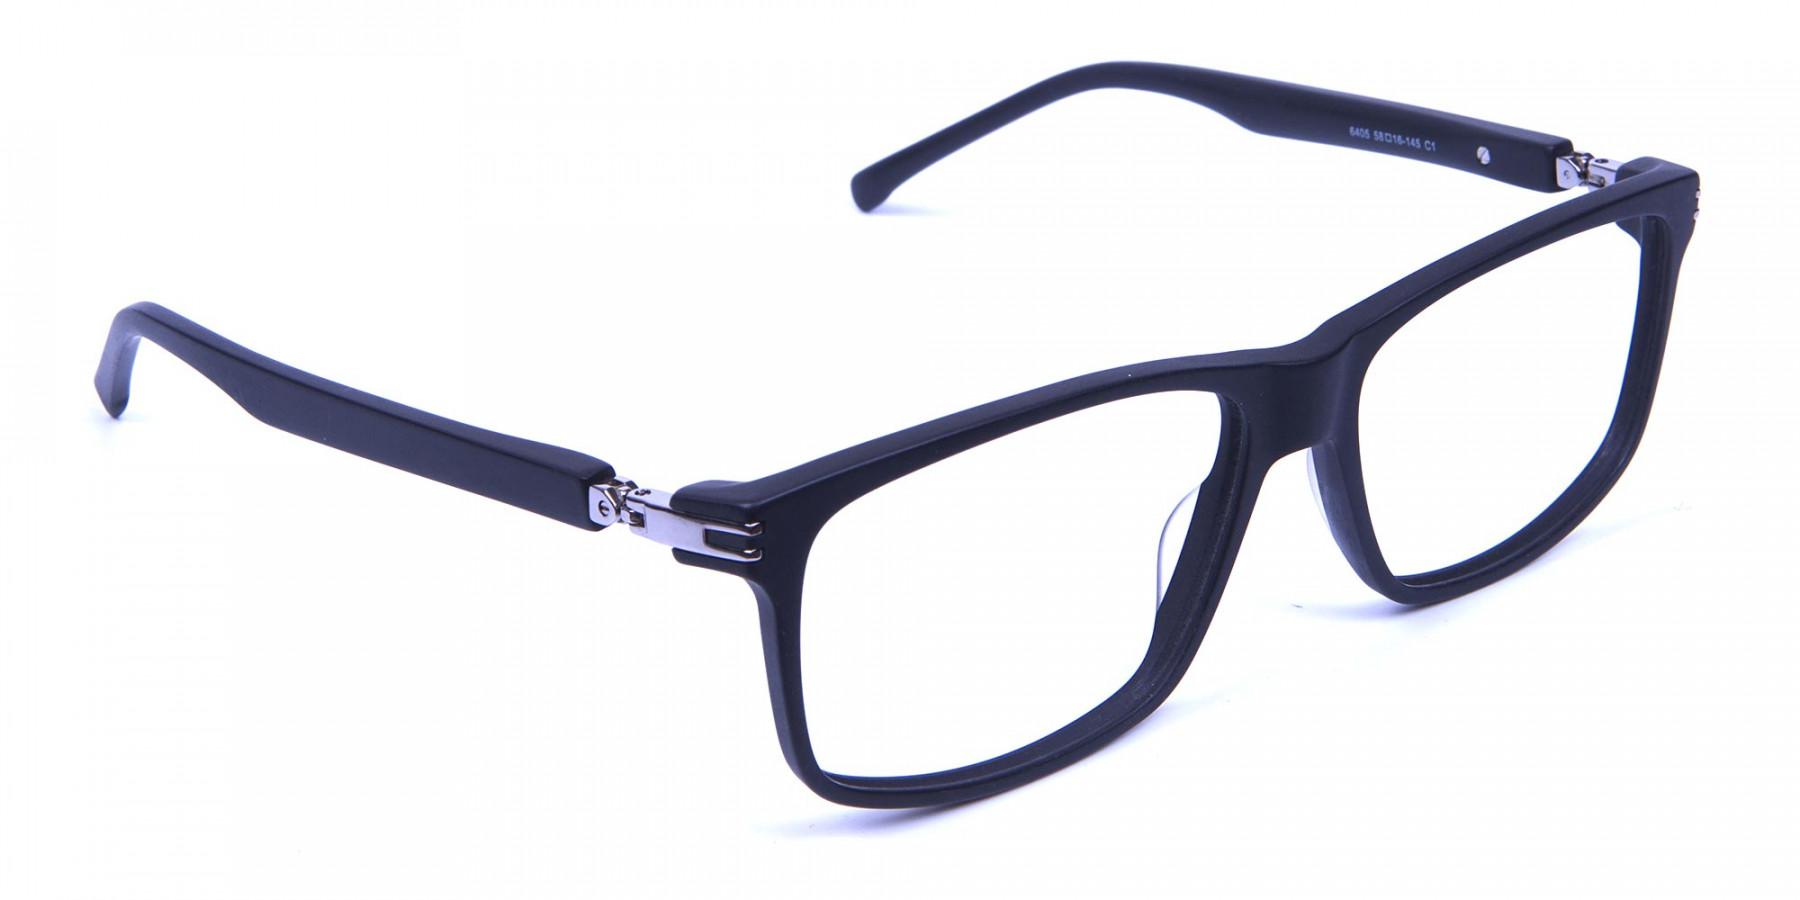 Super Flexible 360 Degree Bendable Glasses in Matte Black